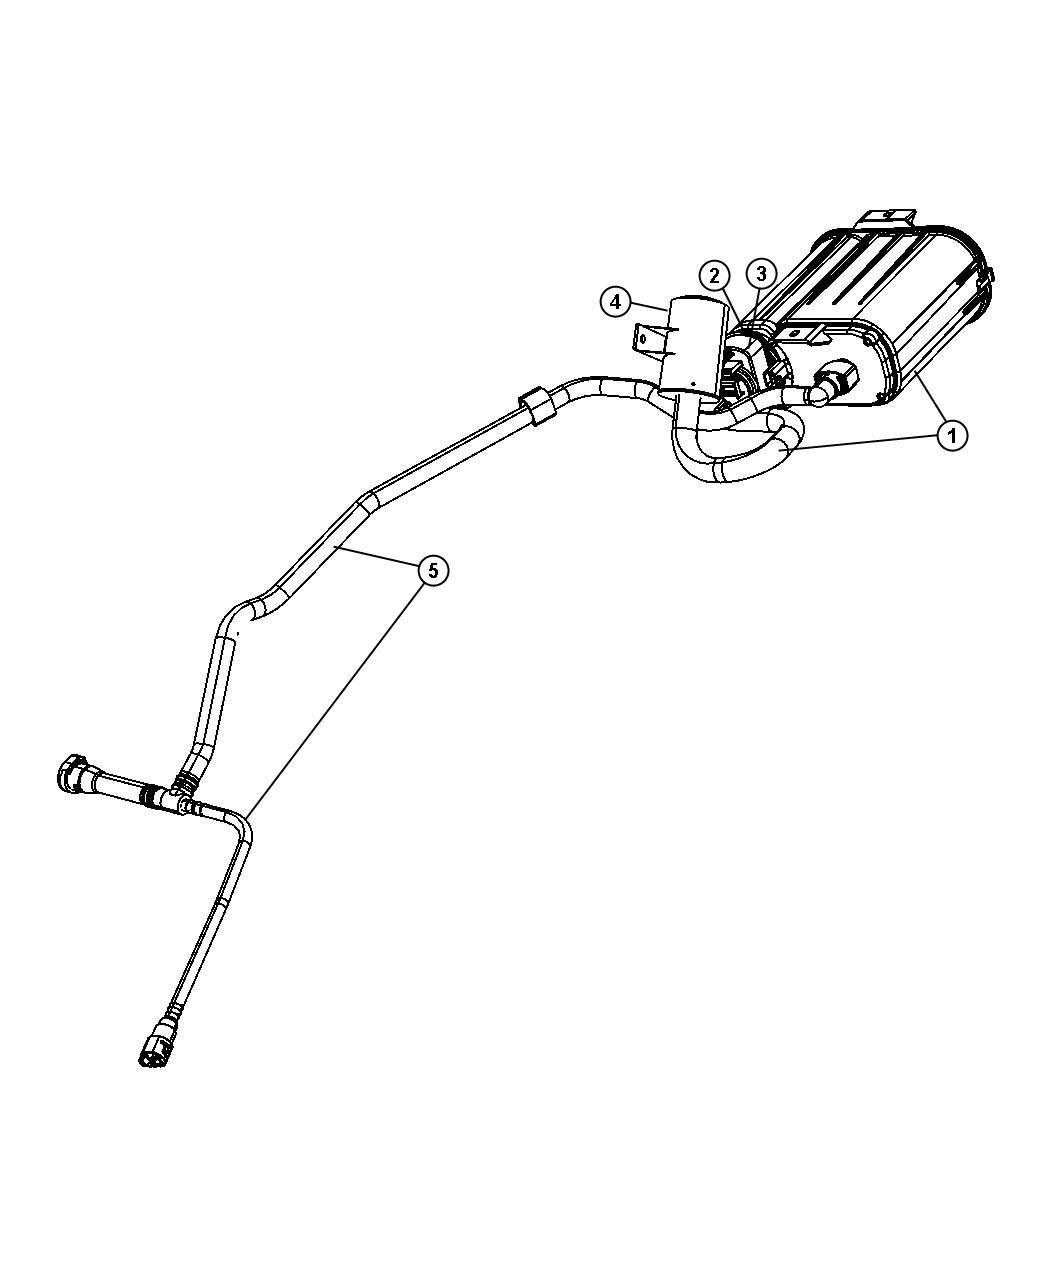 2008 Dodge Avenger Vapor Canister and Leak Detection Pump